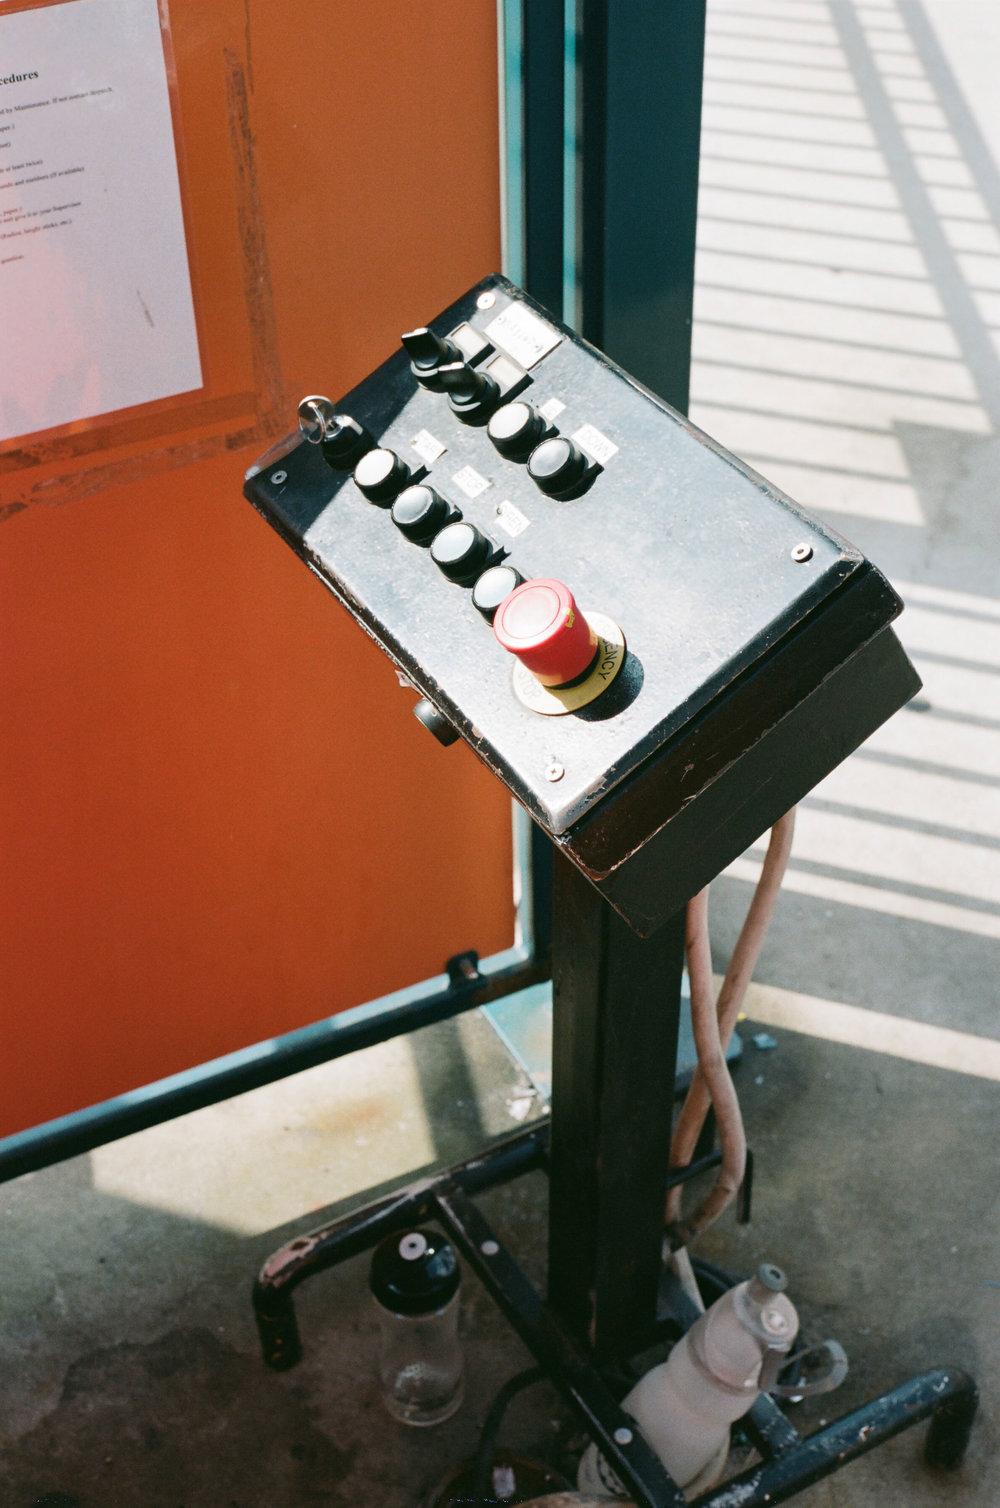 35mm-Fam-ConeyIsland-6.jpg